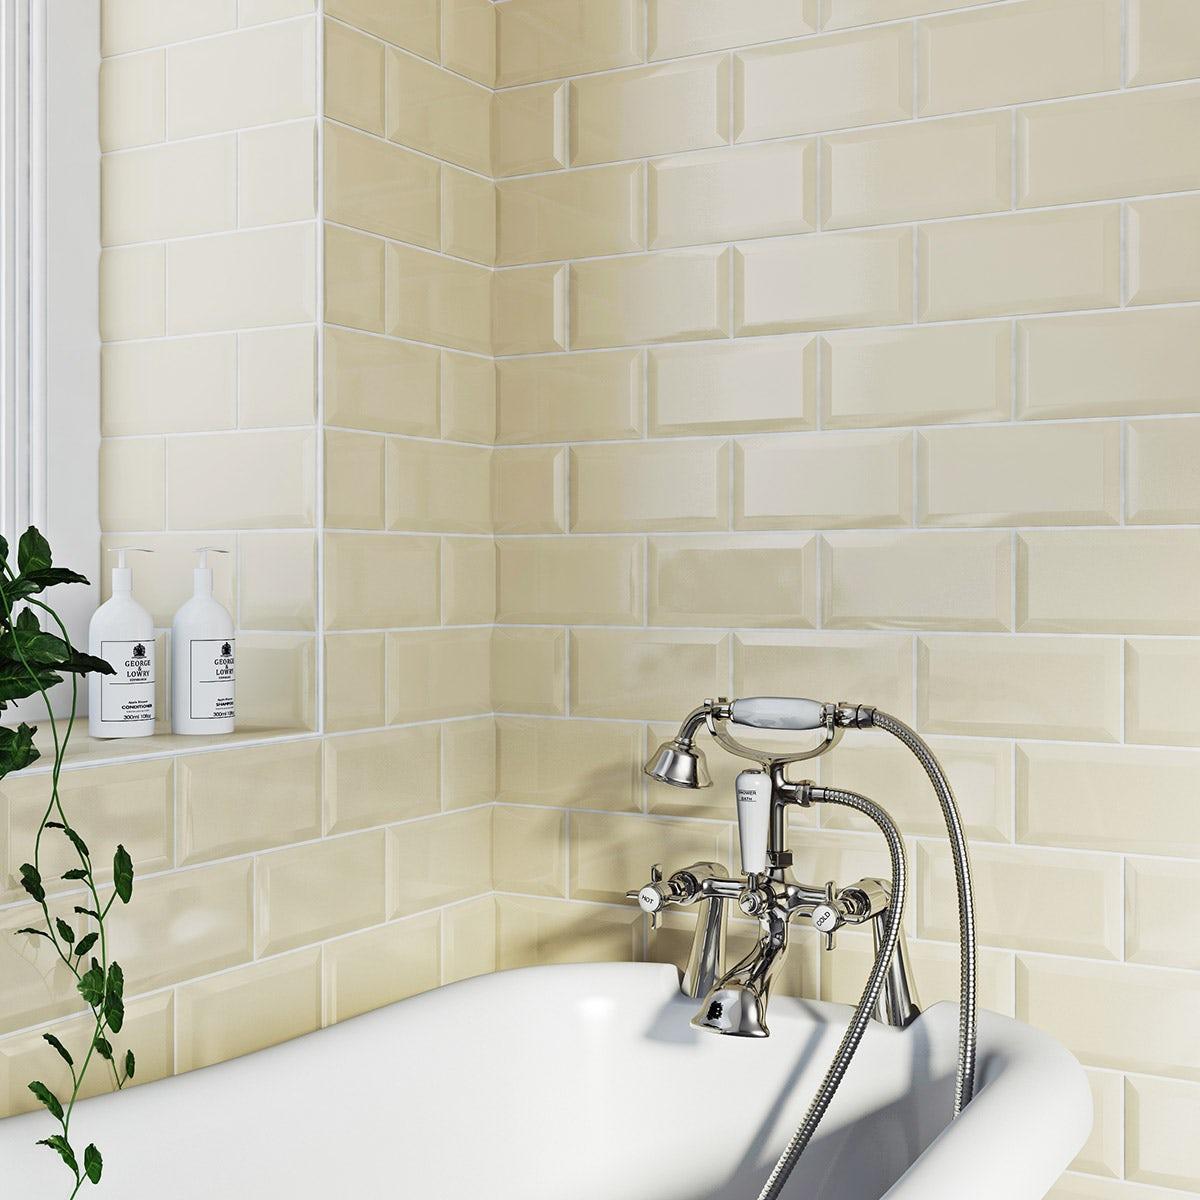 Ceramic tile metro bevel cream gloss tile 100mm x 200mm british ceramic tile metro bevel cream gloss tile 100mm x 200mm dailygadgetfo Images